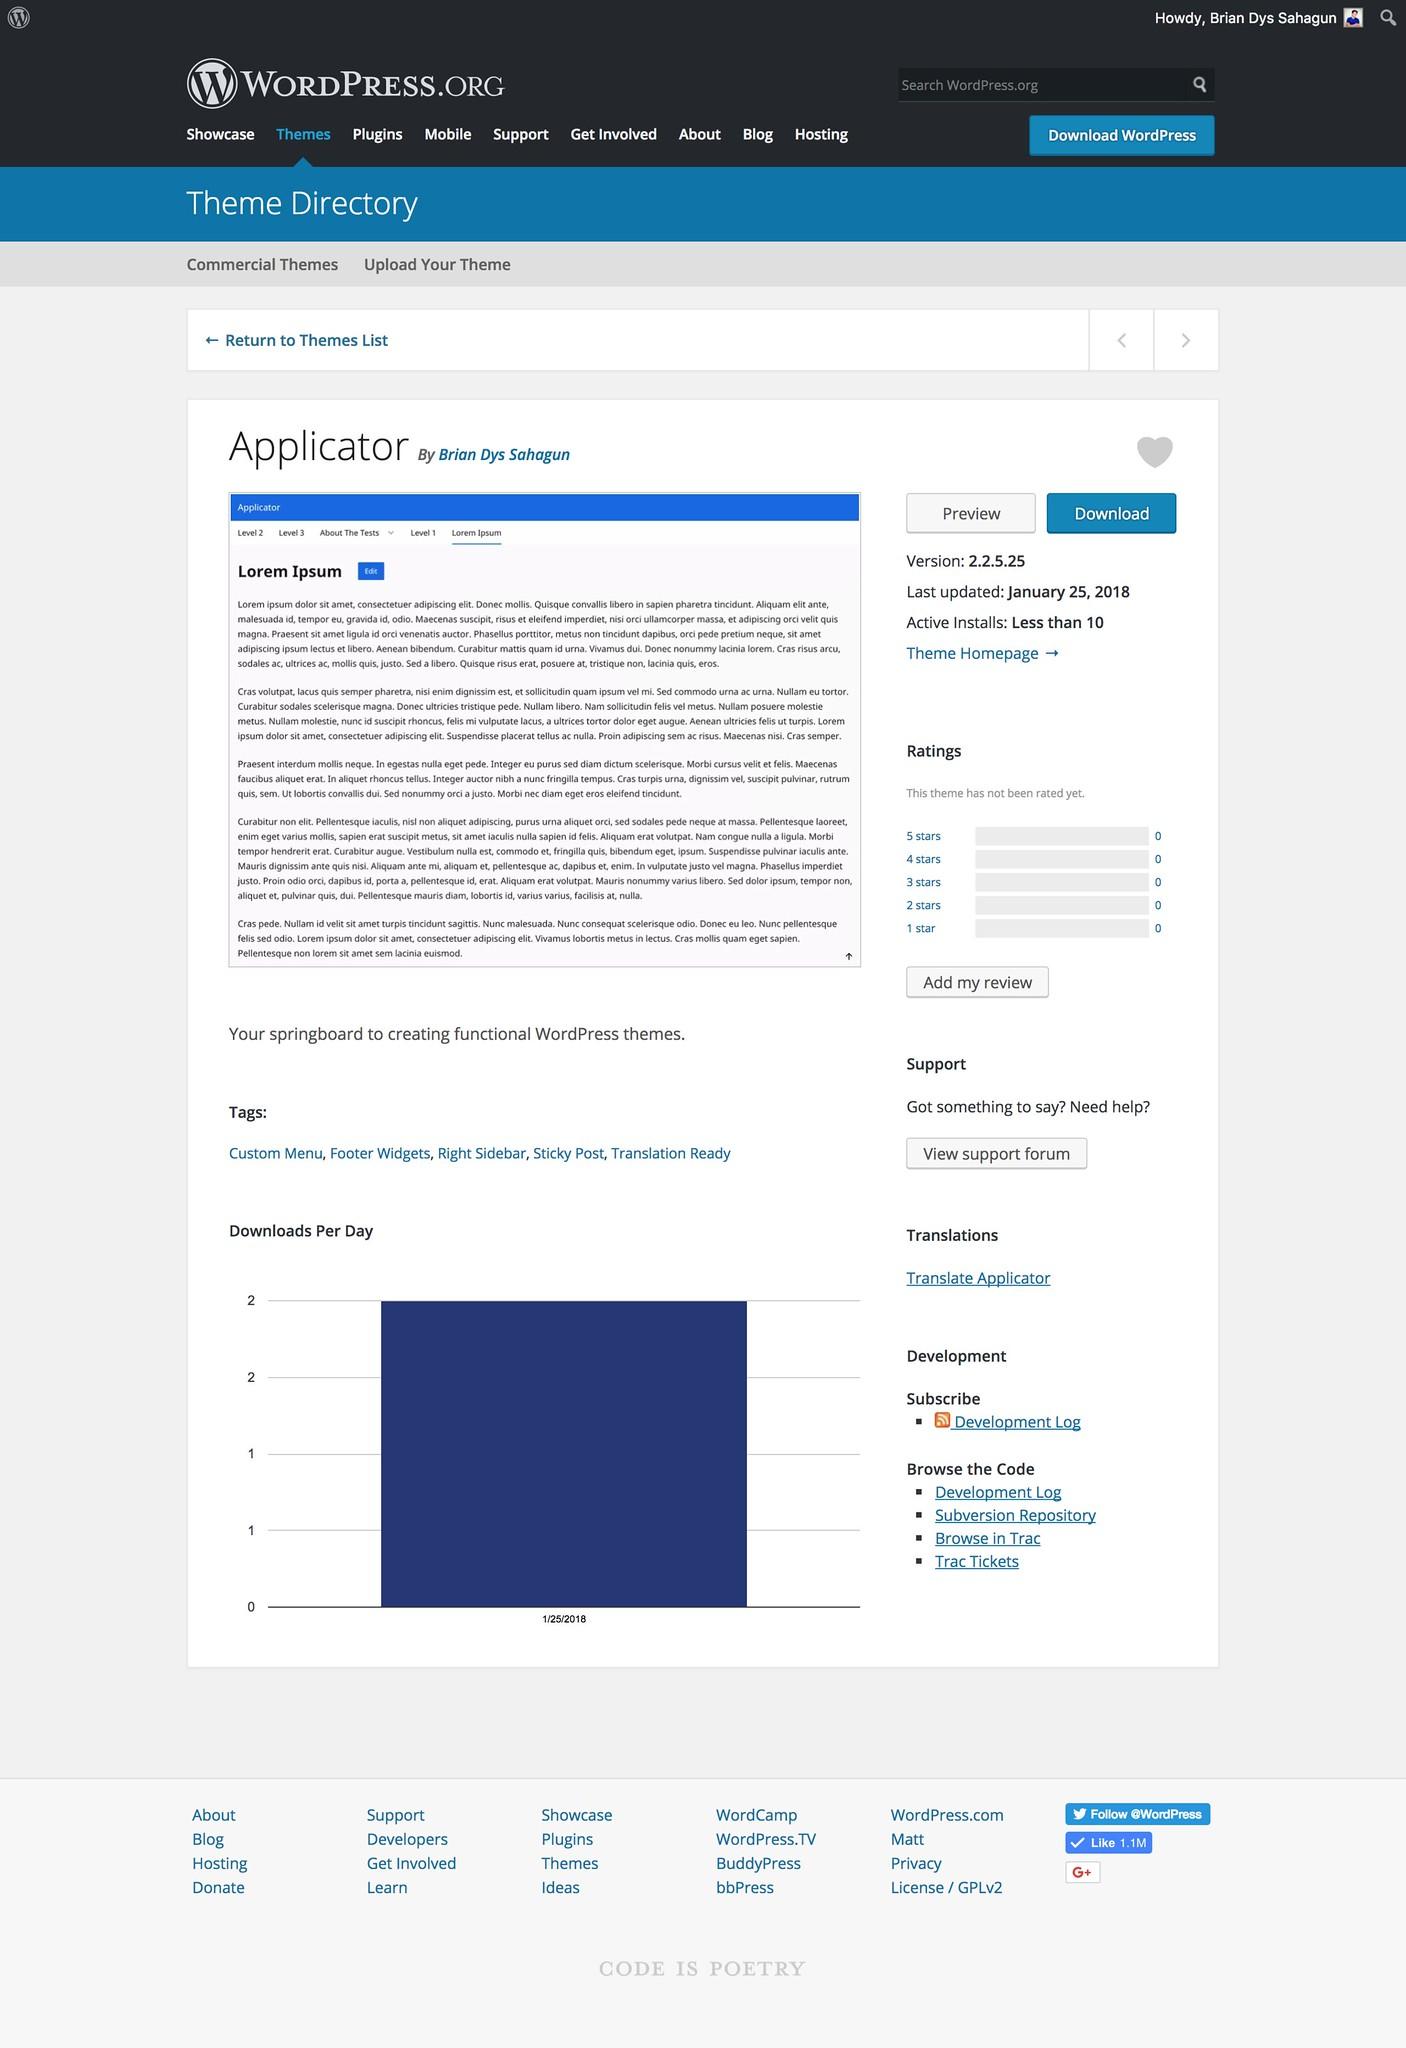 Applicator on WordPress